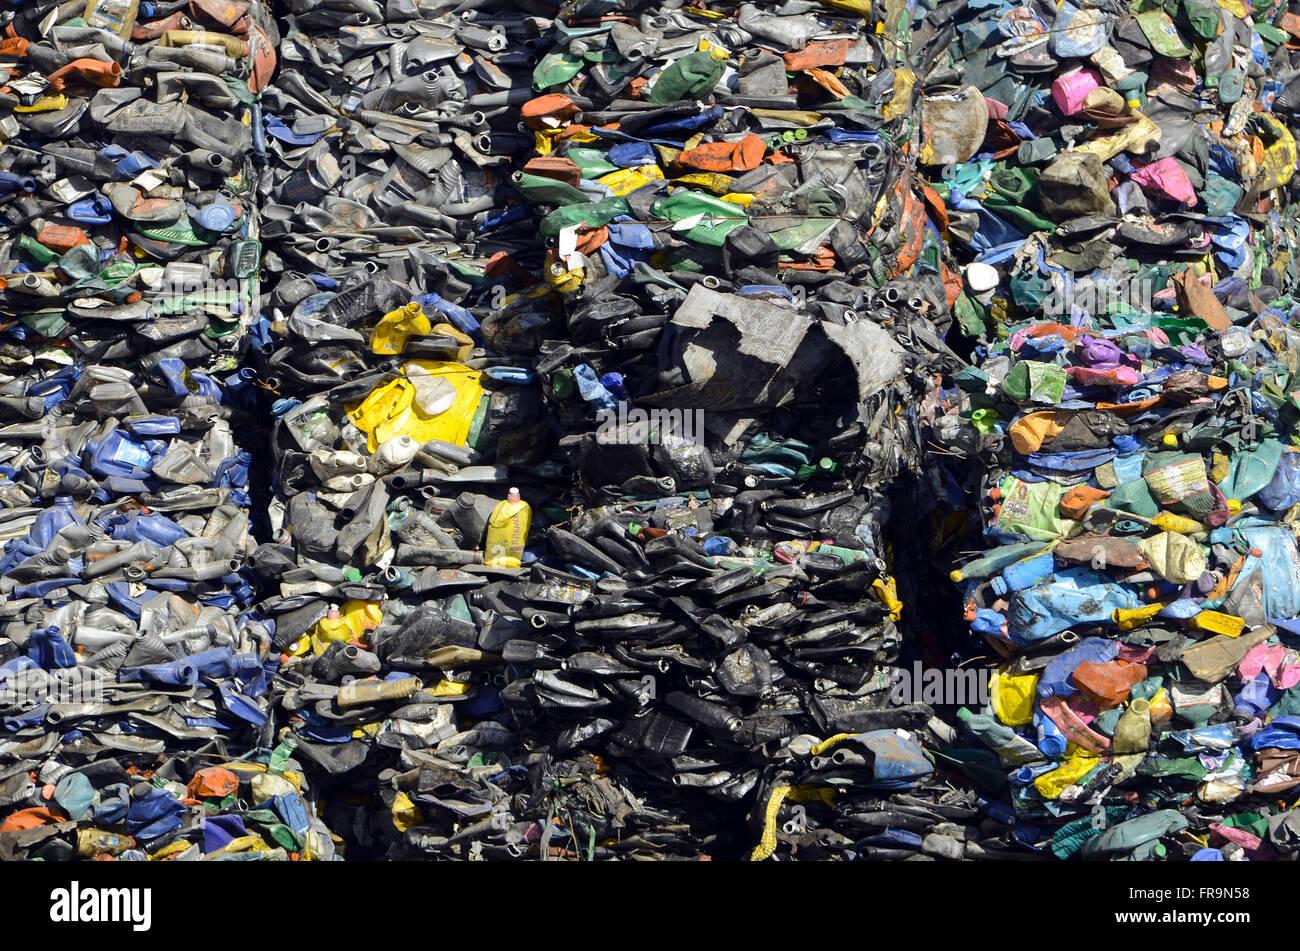 Pressed garbage for recycling - Sanitary Landfill of Jardim Gramacho - Stock Image